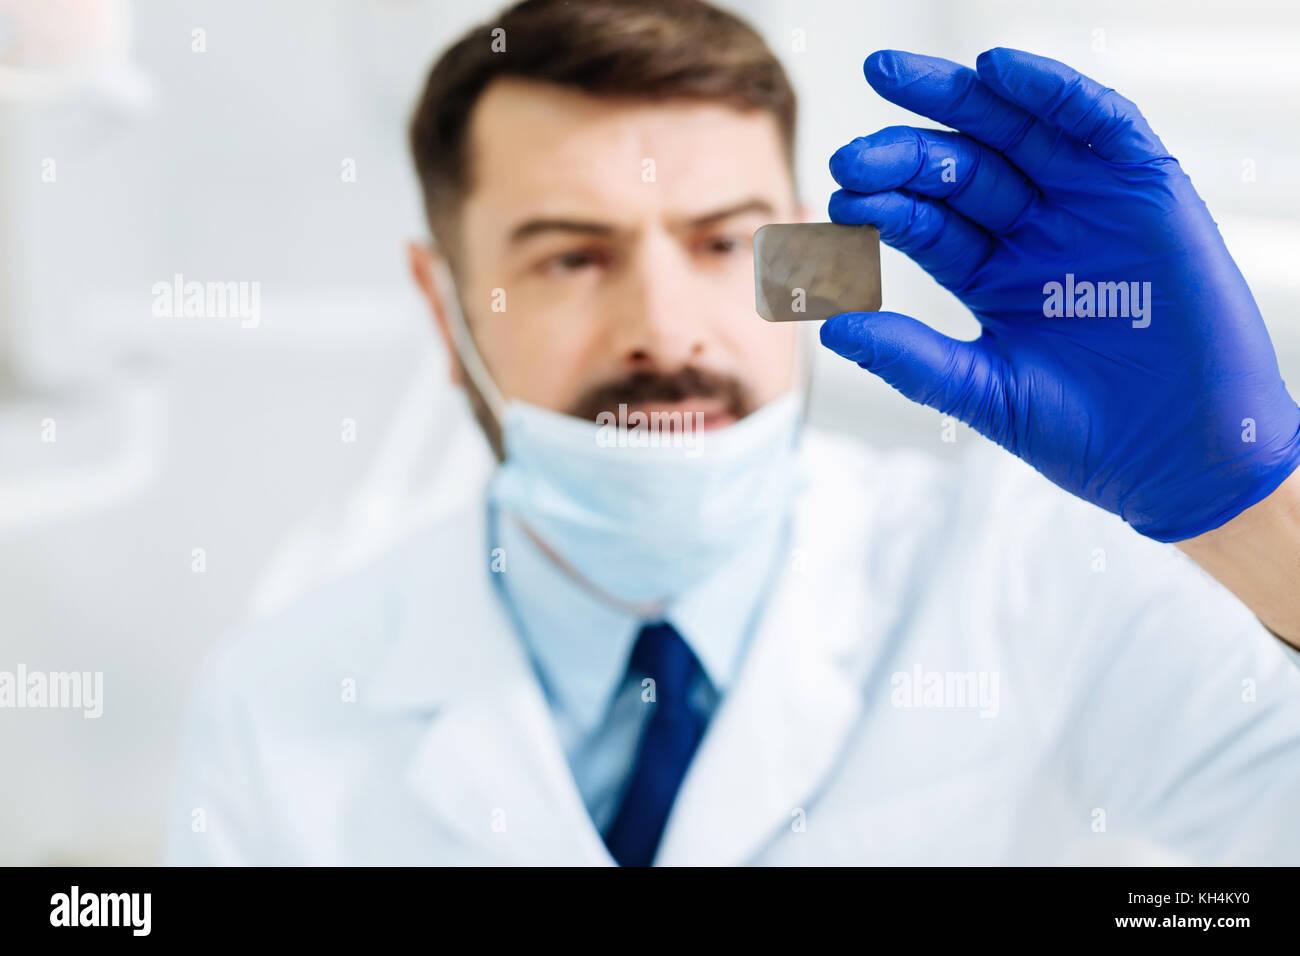 Close up of dental Xray image - Stock Image